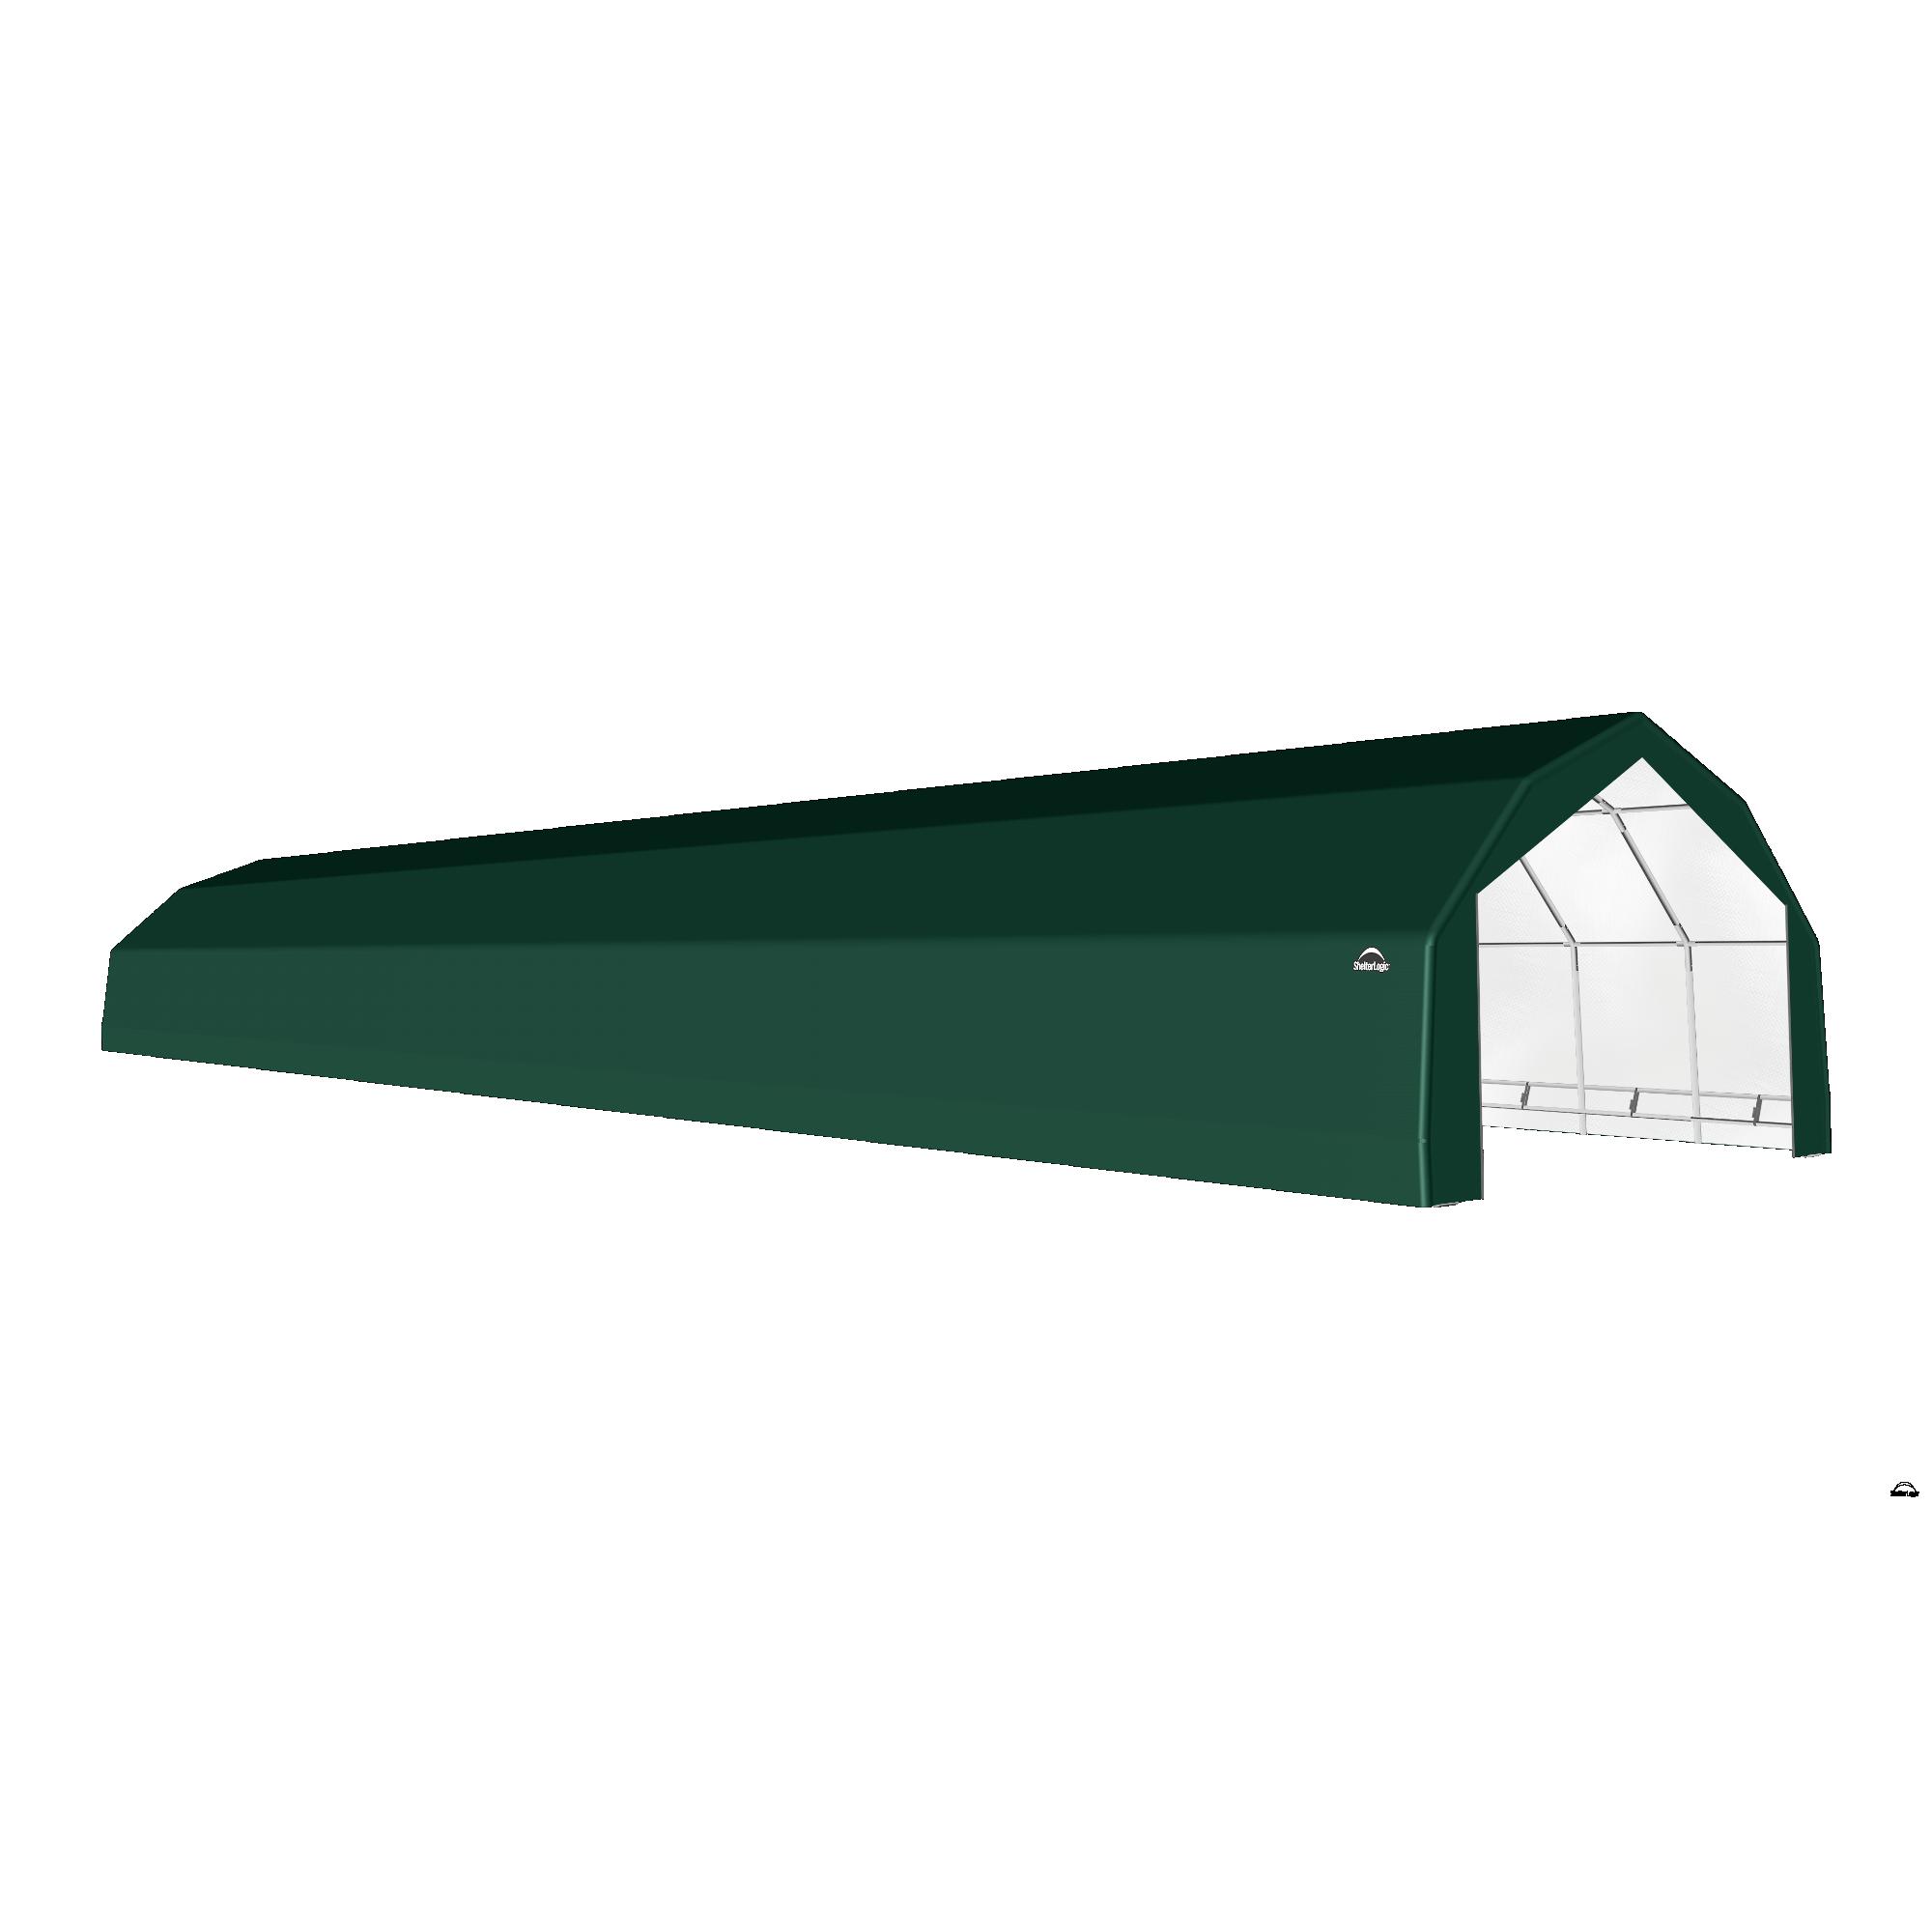 SP Barn 20X92X12 Green 14 oz PE Shelter